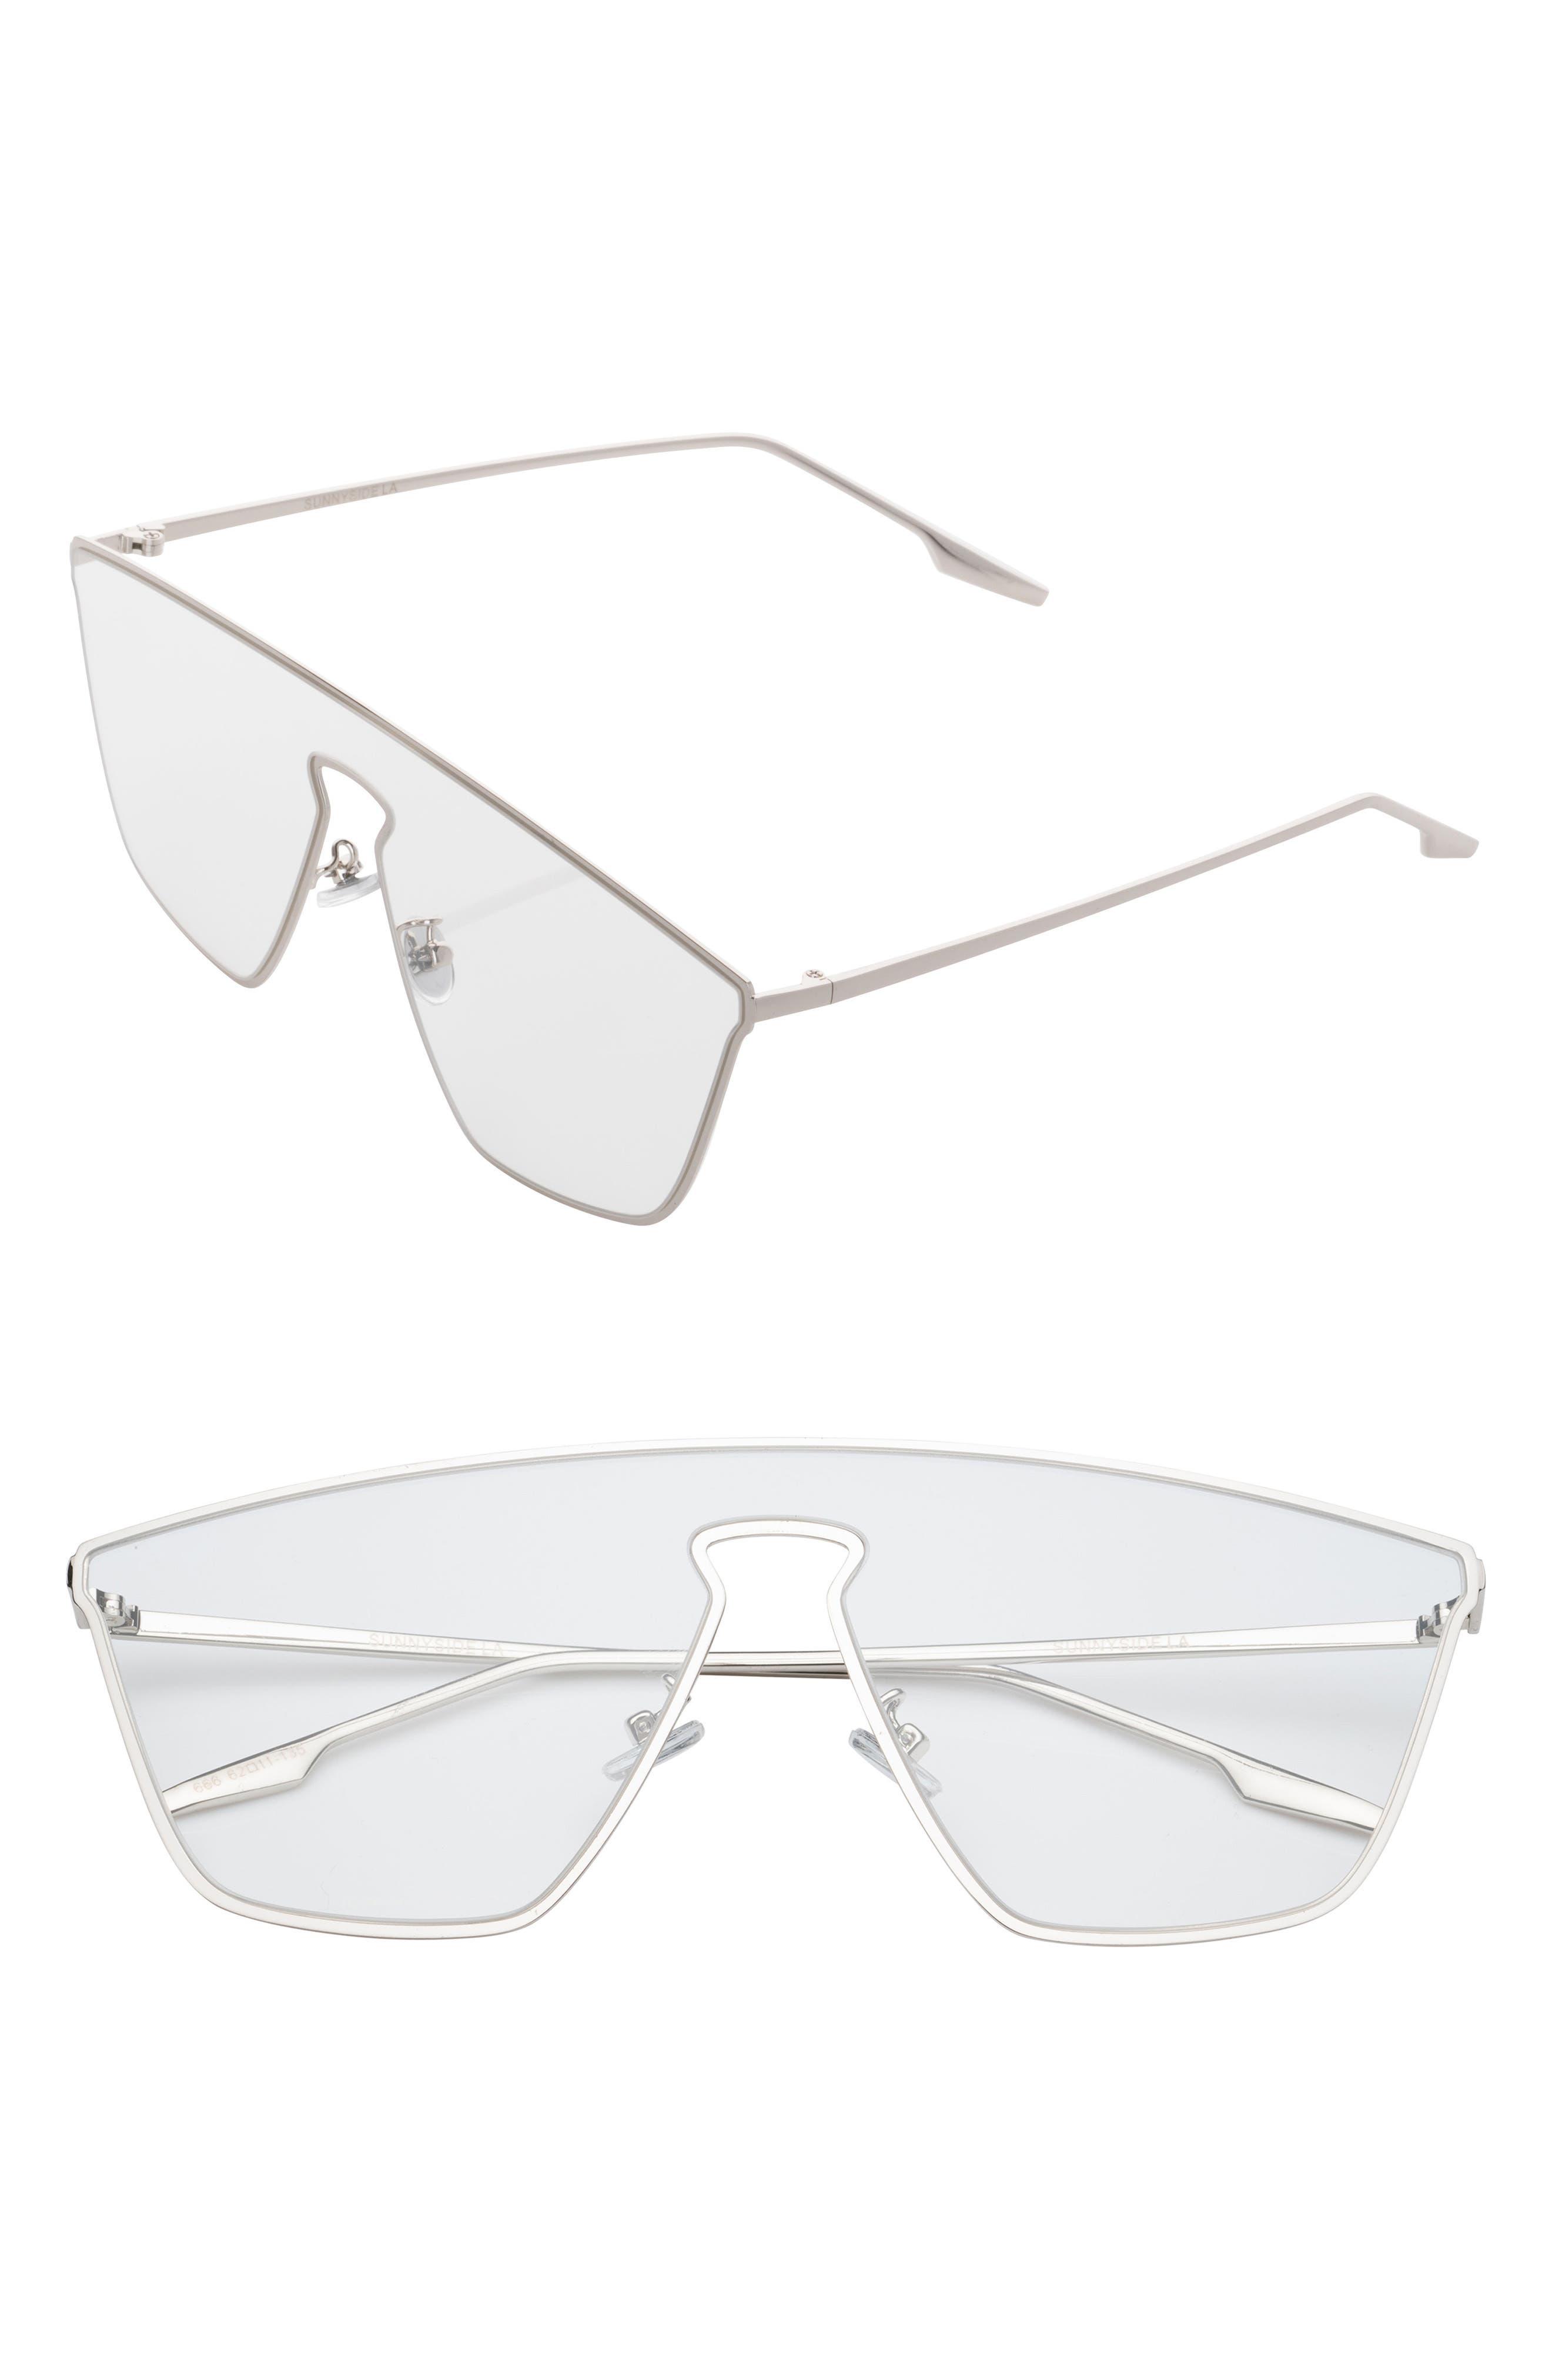 Irregular 65mm Clear Glasses,                             Main thumbnail 1, color,                             040